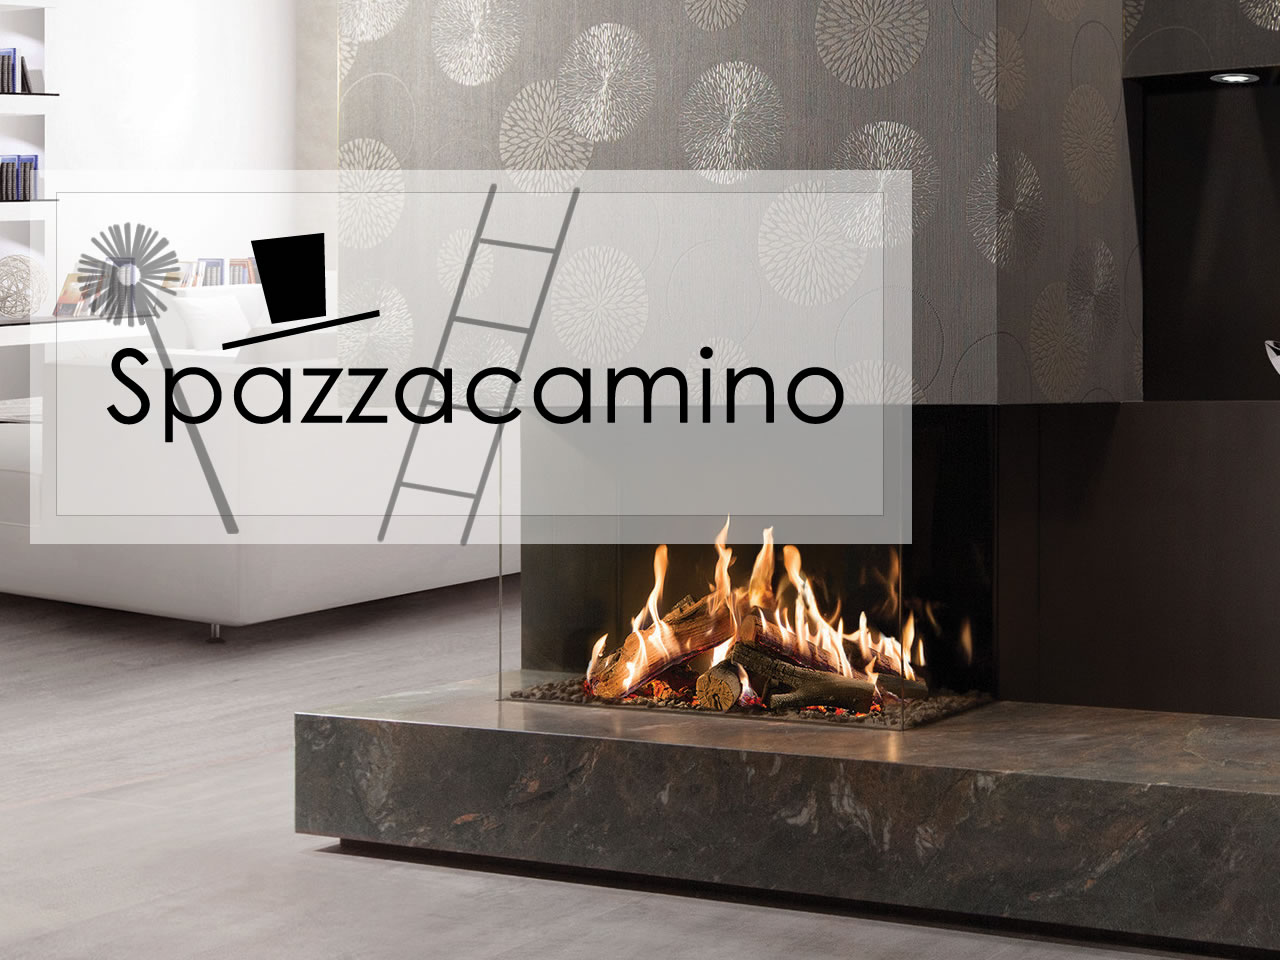 Carlo Farini Milano - Spazzacamino Canna Fumaria a Carlo Farini Milano